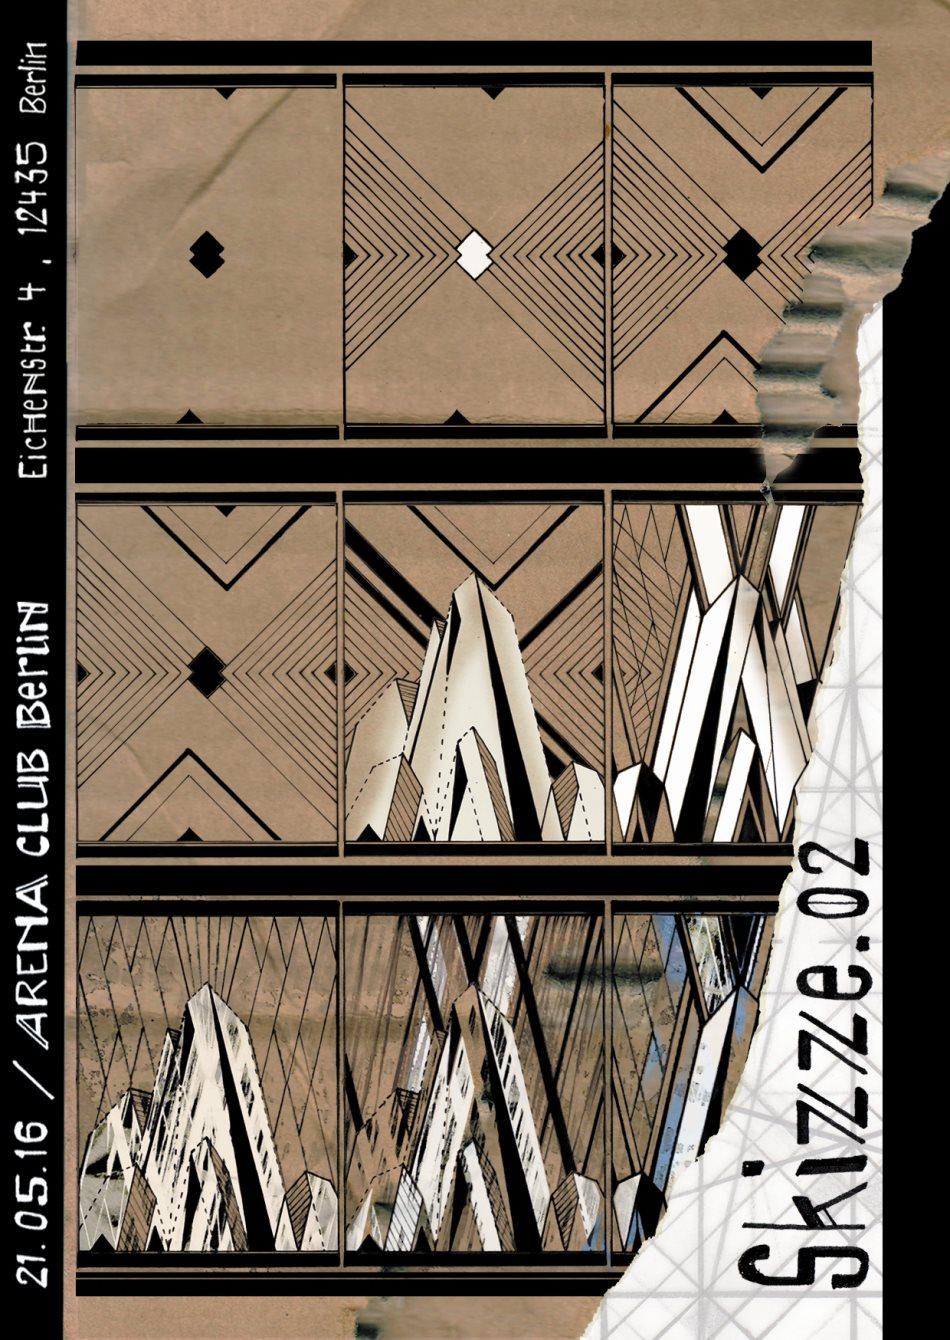 Skizze.02 - Flyer front